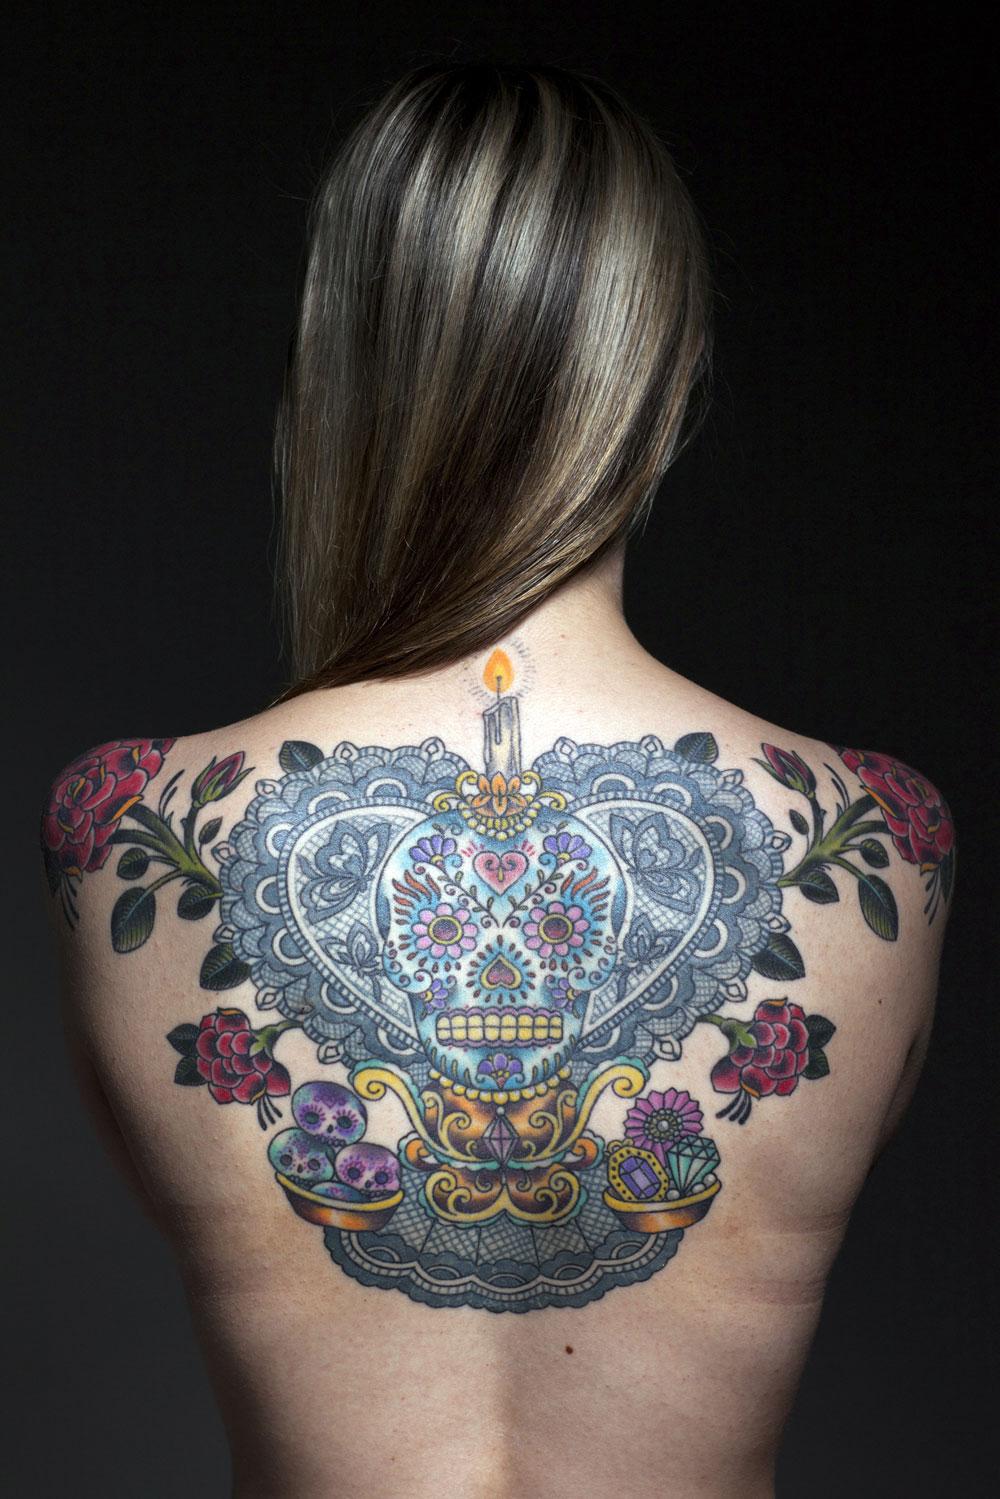 Karl Marc Tattoo Karl Marc Ashleigh Tattooed